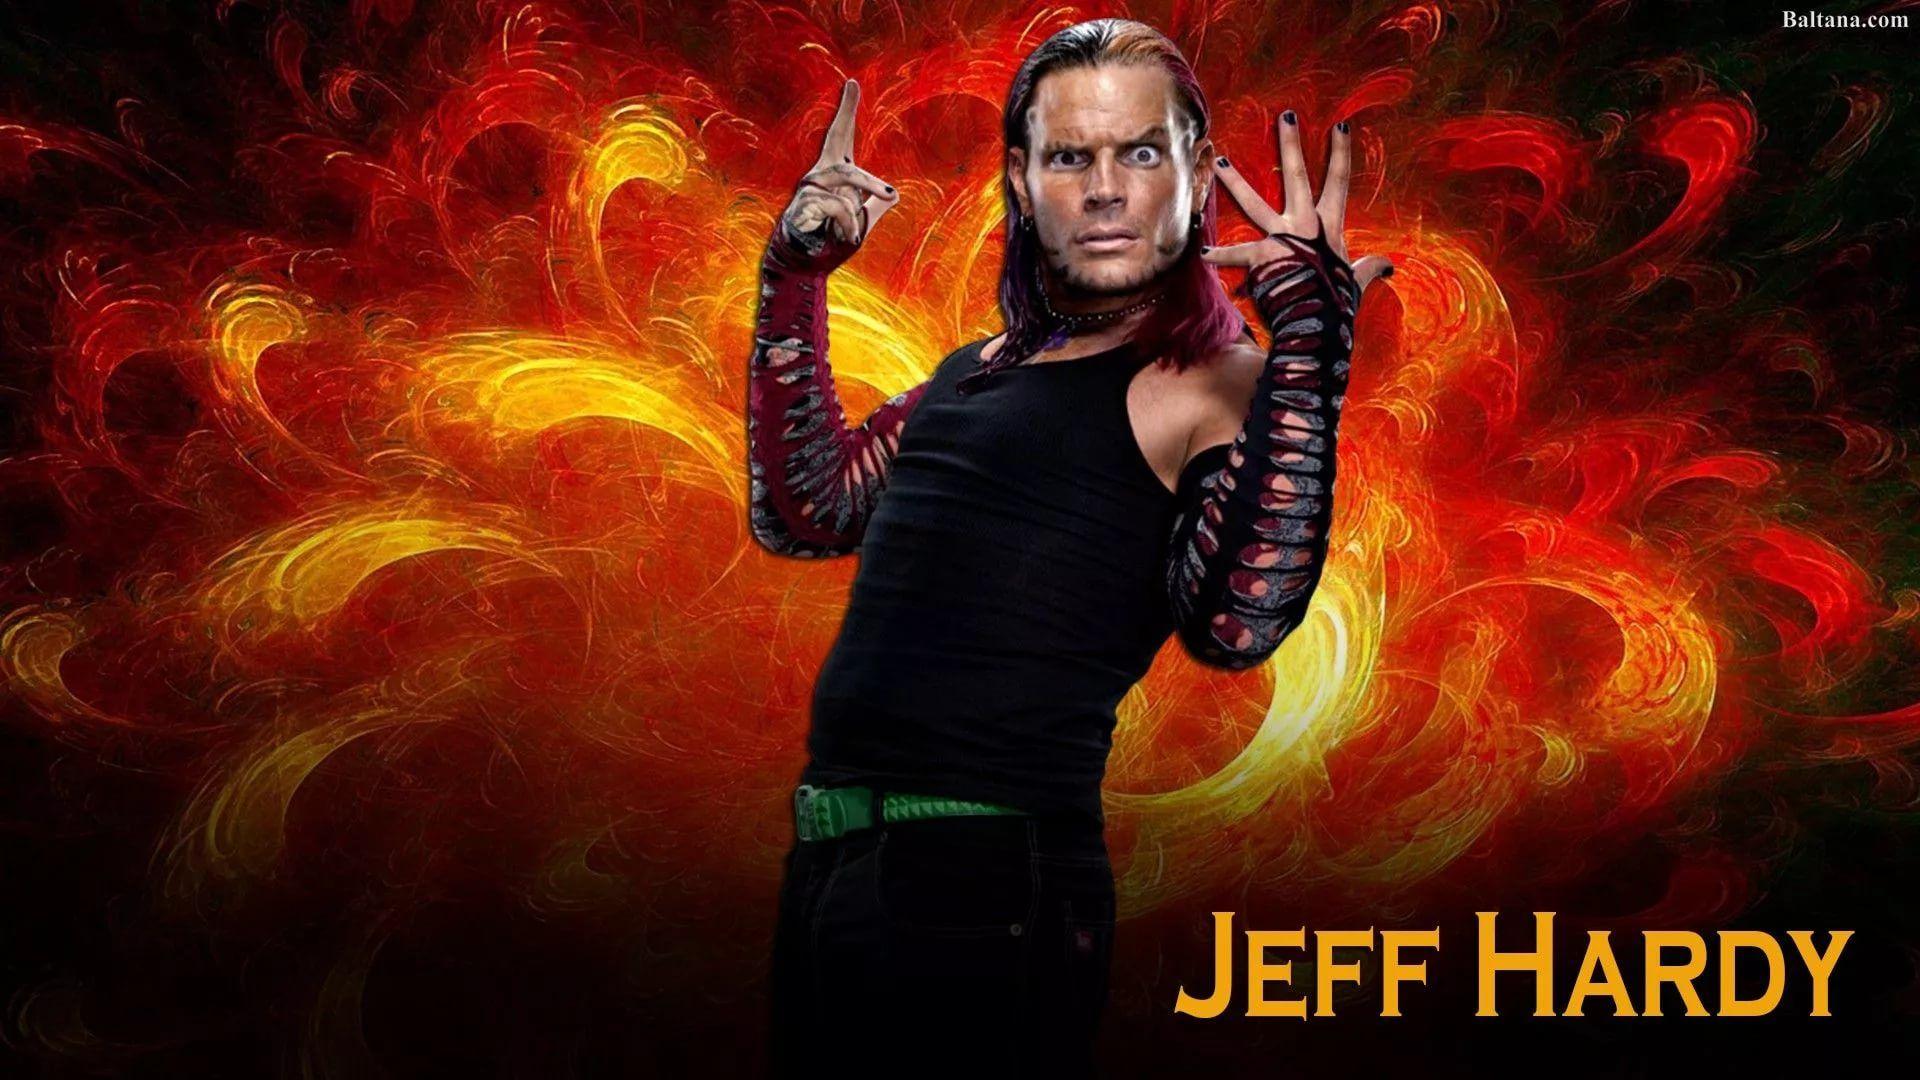 Jeff Hardy Nice Wallpaper